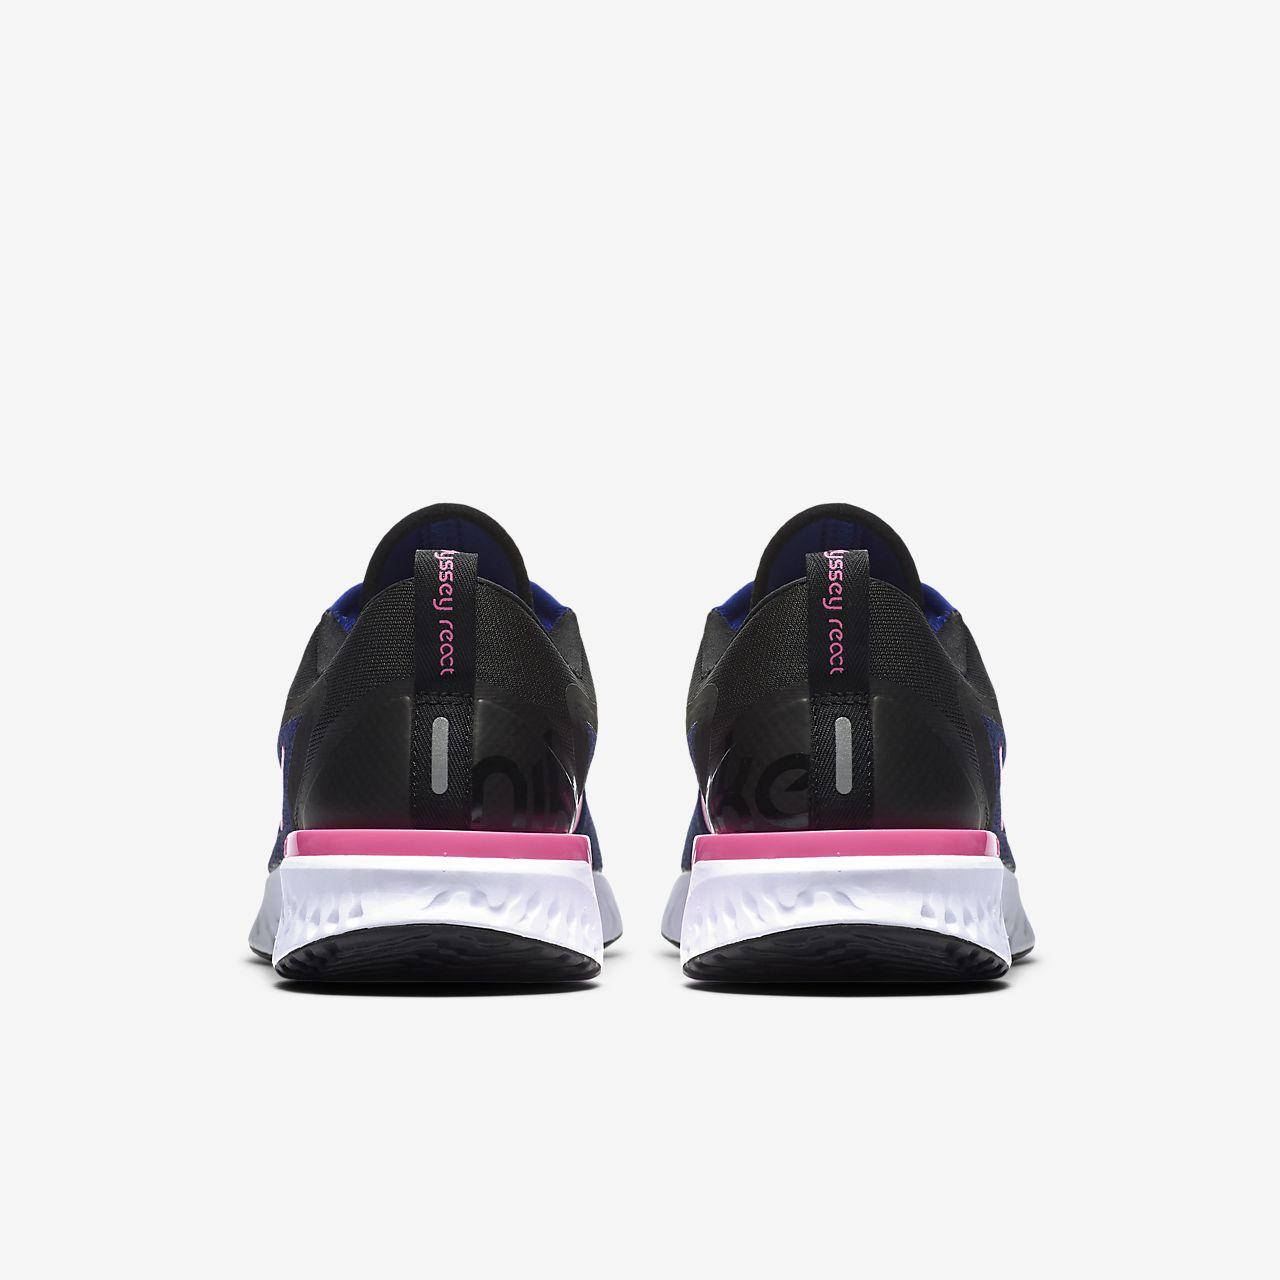 6b9f081c8018 scarpa da running nike odyssey react deep royal blue nero bianco pink blast  ao9820-403